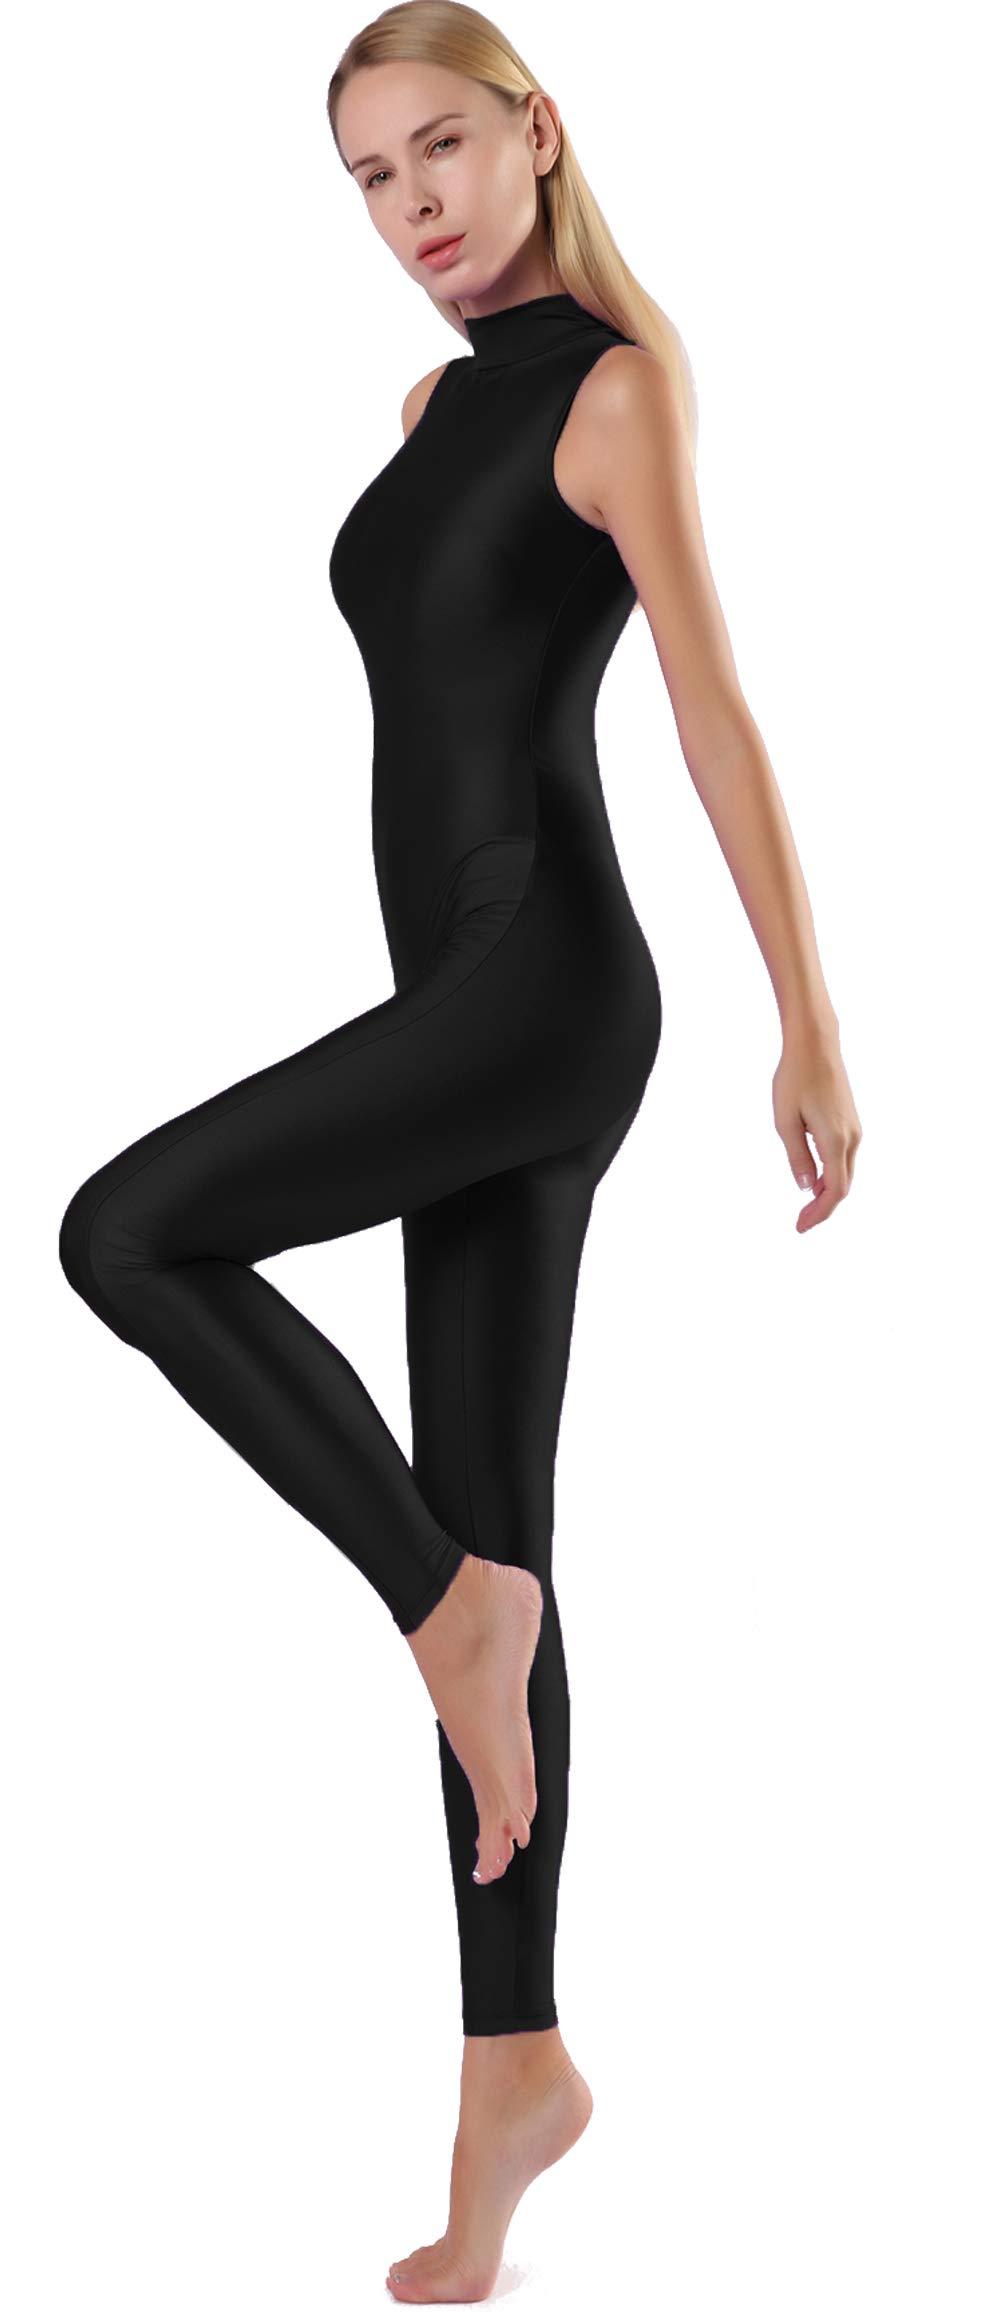 Speerise Bodycon Jumpsuits Rompers Turtle Neck Sleeveless Zip Yoga Unitard Black L